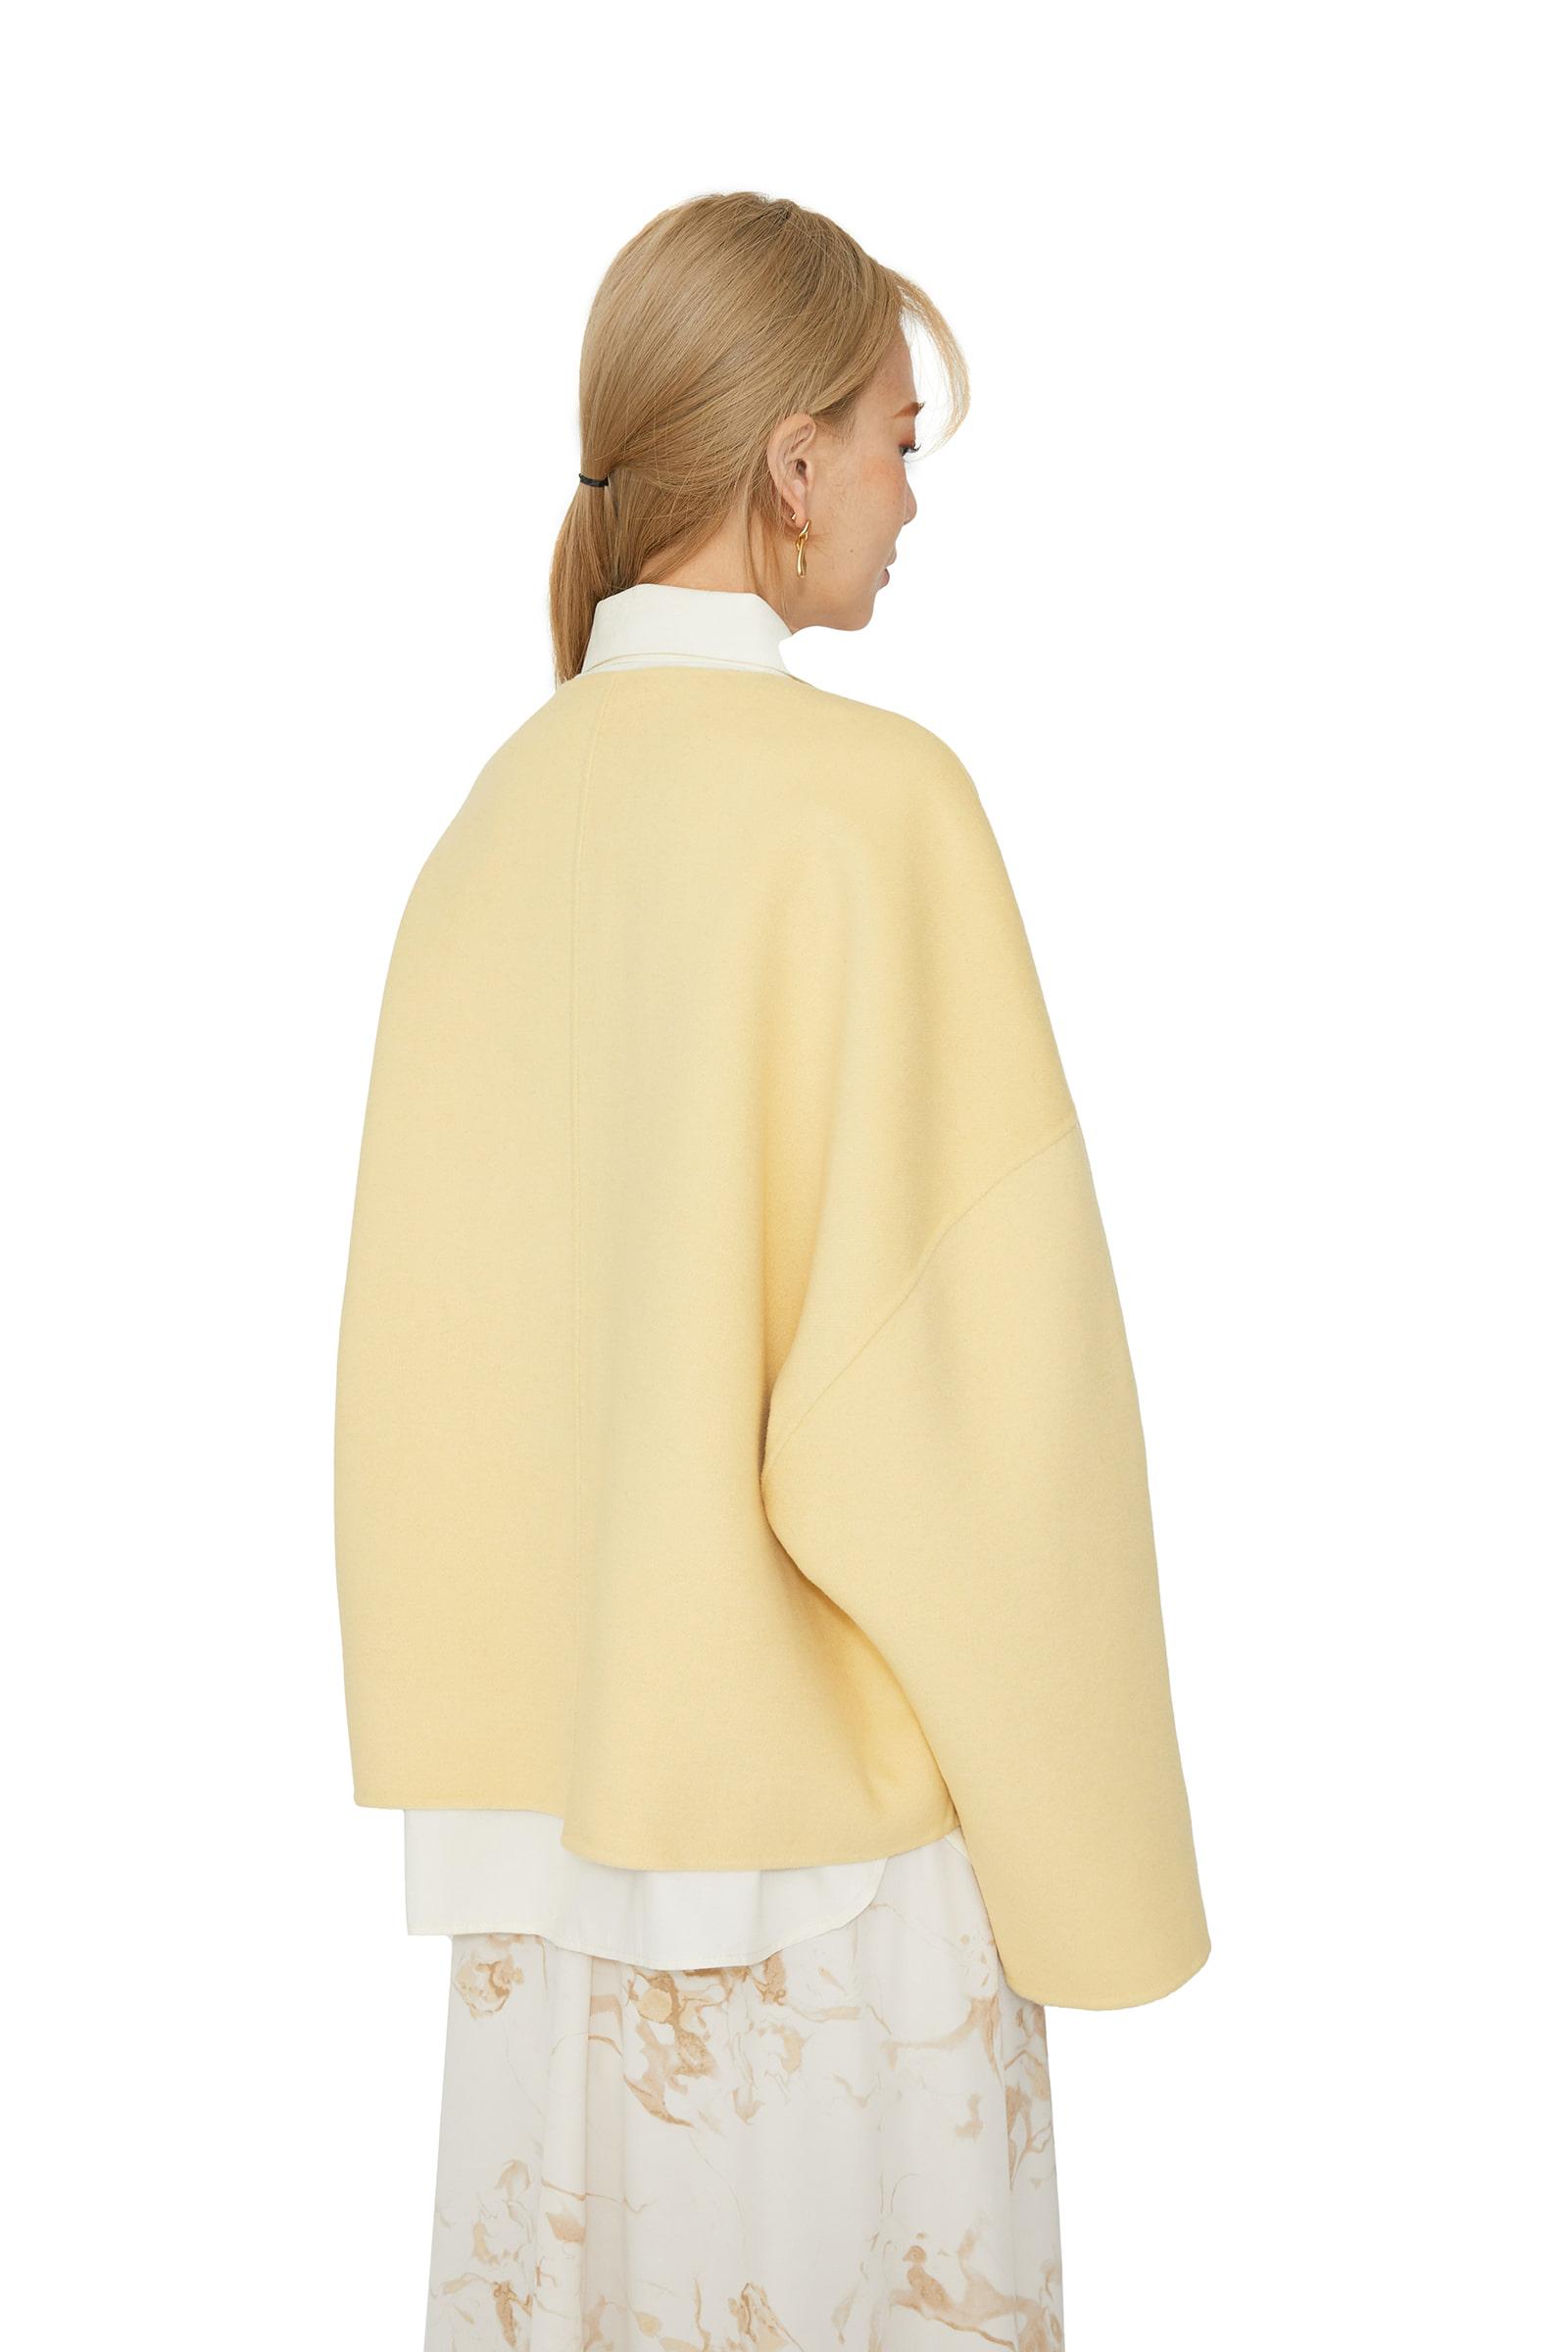 Awesome Karaless Handmade Short Coat